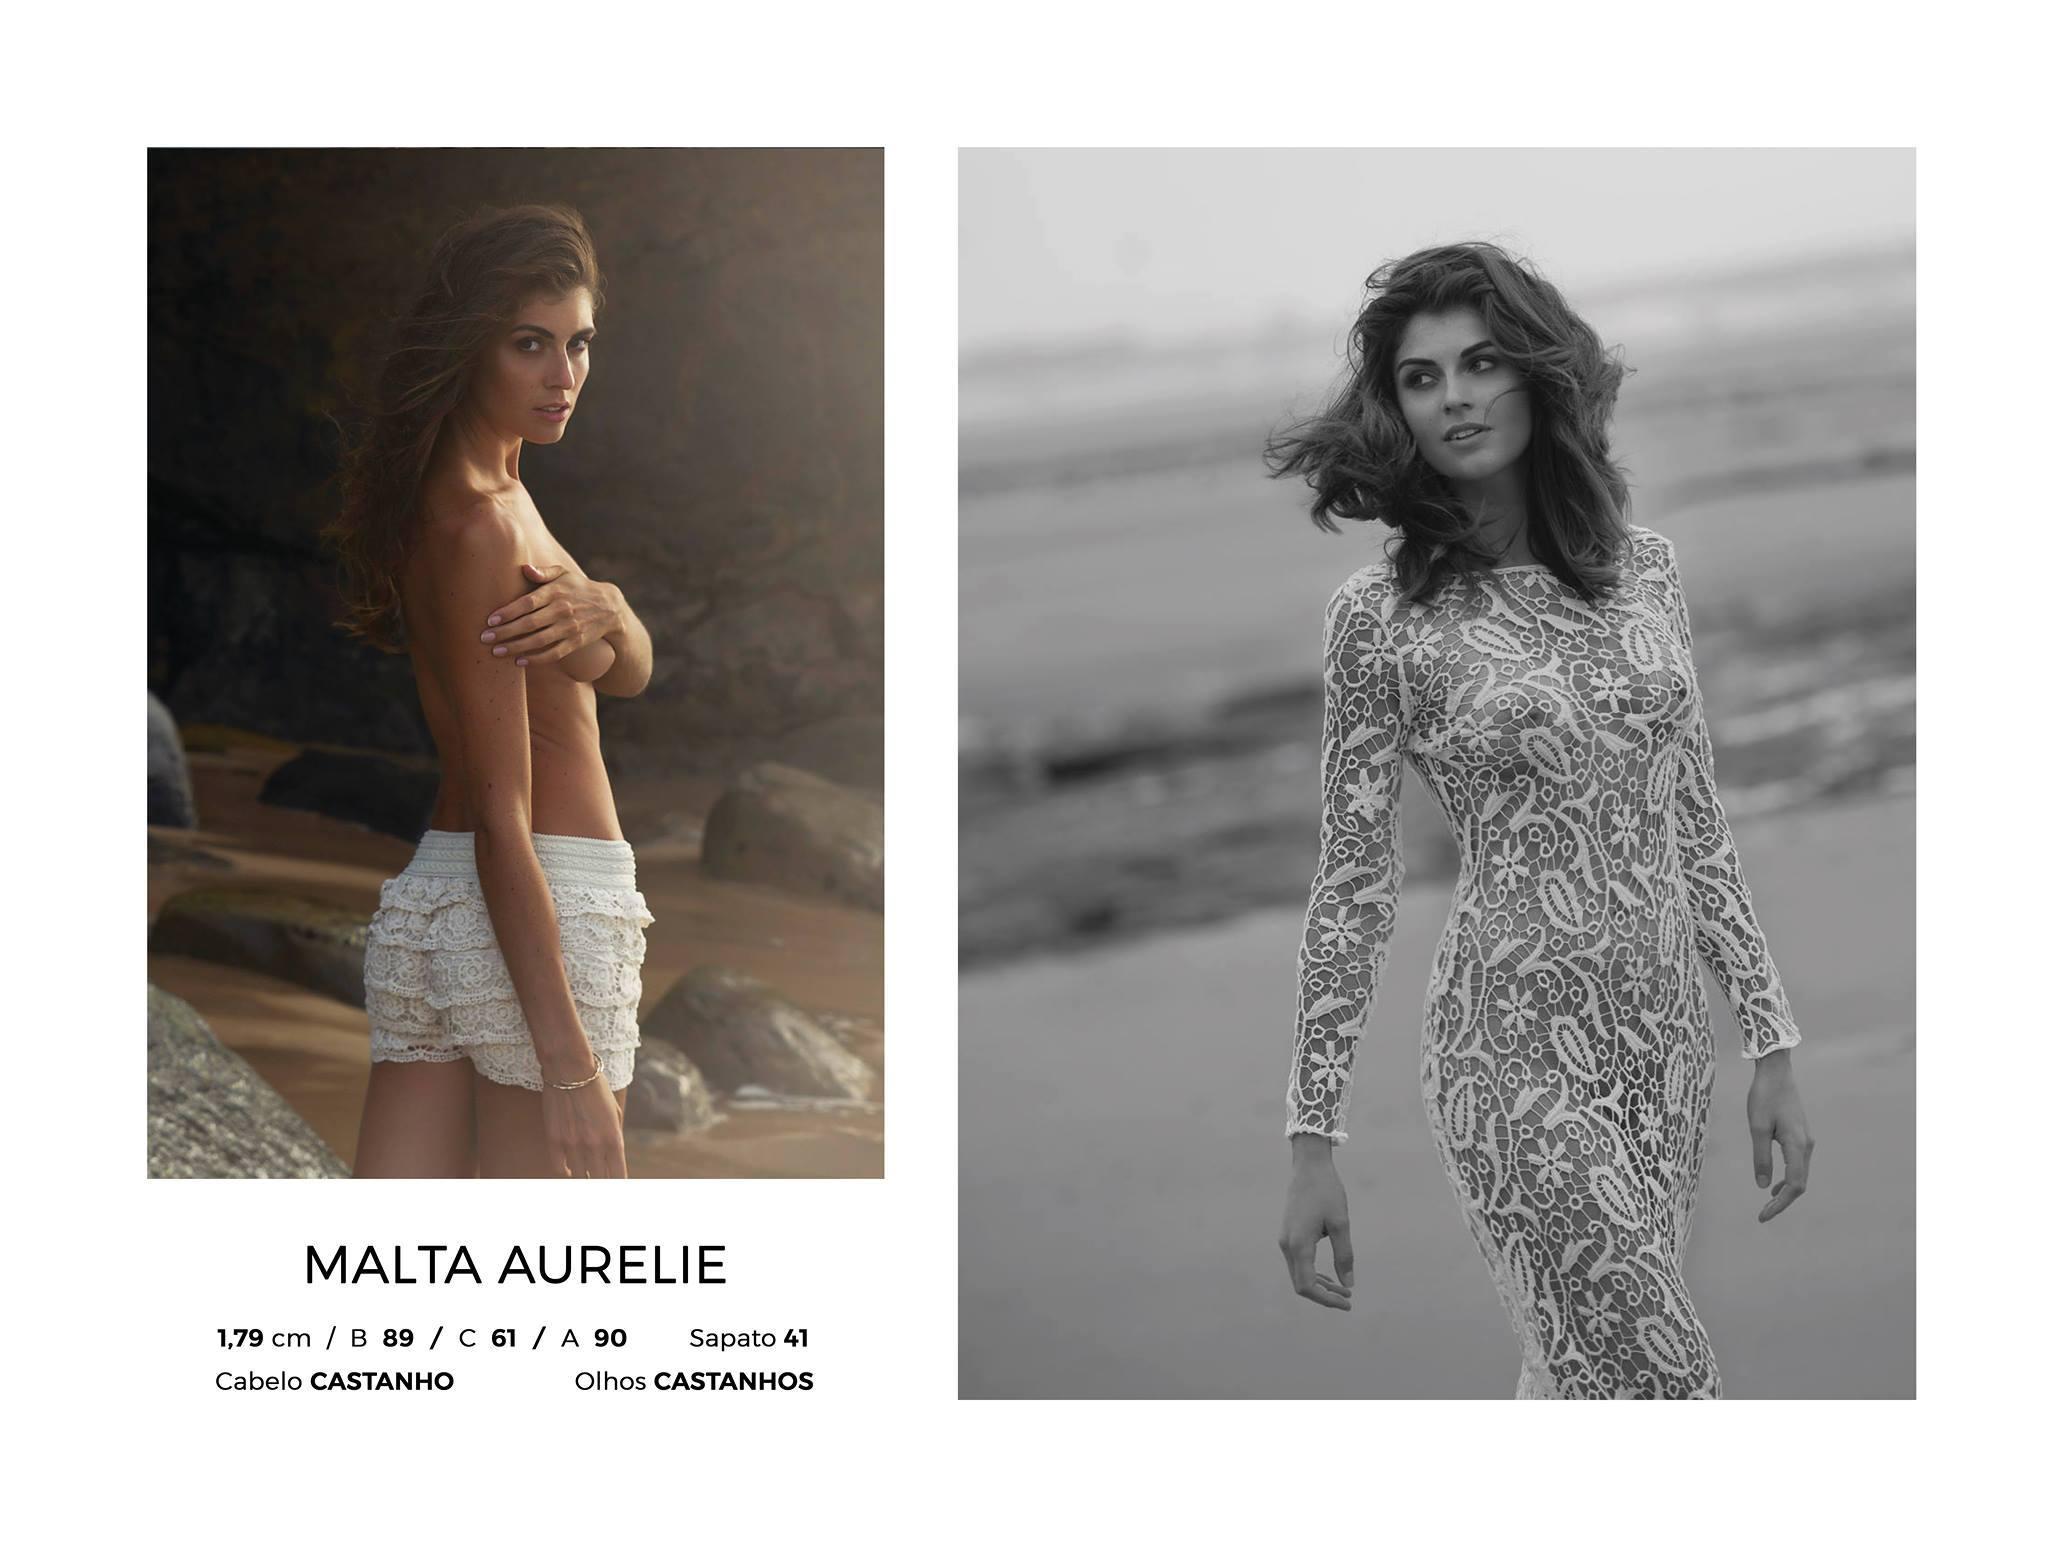 lingerie Youtube Aurelie Malta naked photo 2017